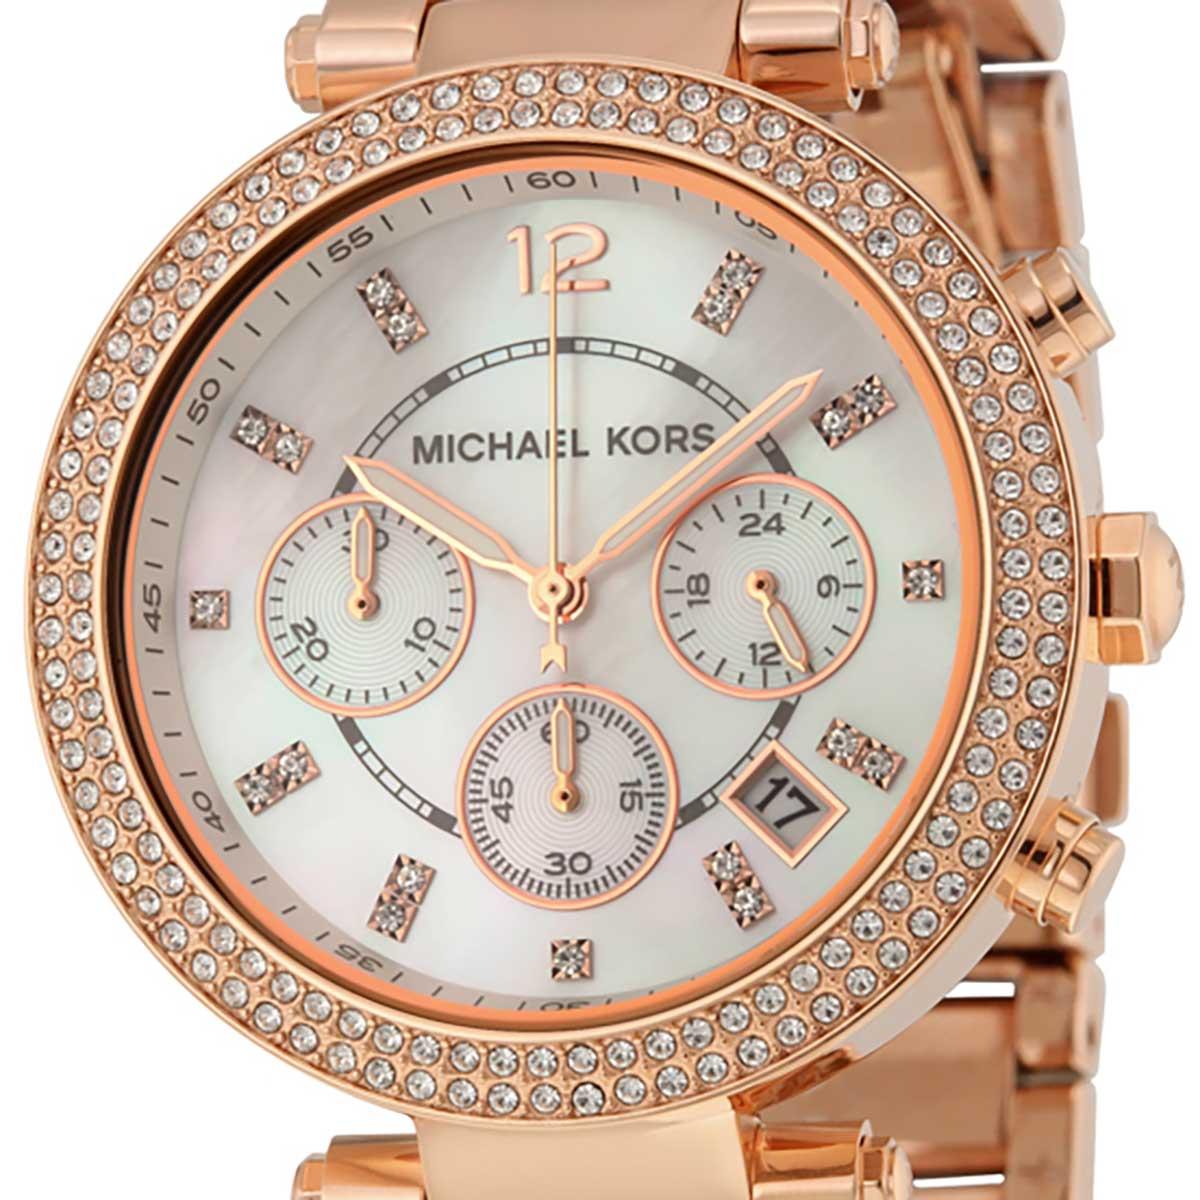 Michael Kors マイケルコース クォーツ 腕時計 米国 ファッションデザイナーズ [MK5491] 並行輸入品 純正ケース メーカー保証